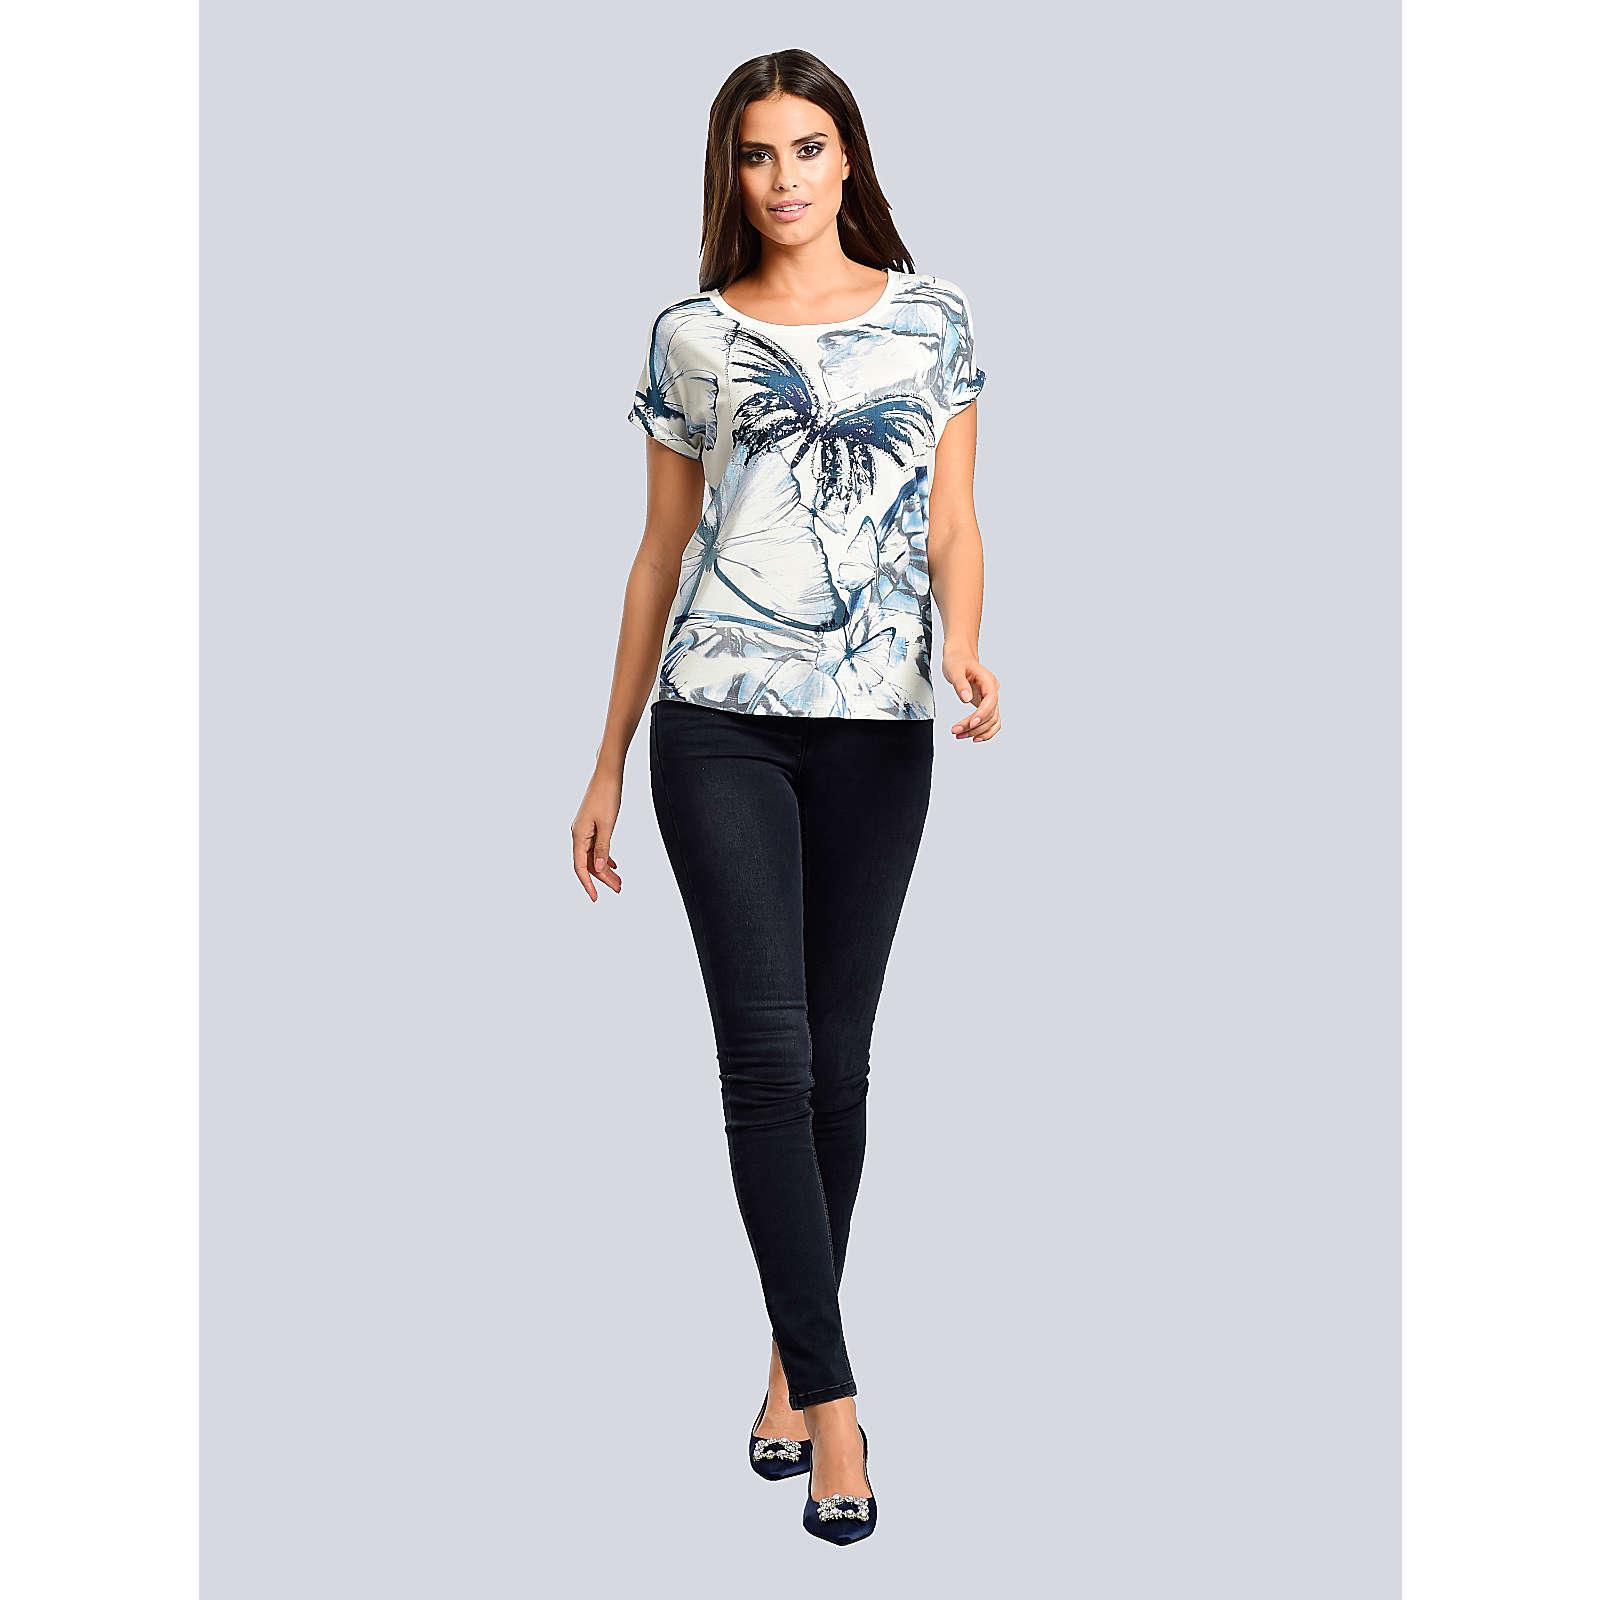 Alba Moda Shirt weiß Damen Gr. 44